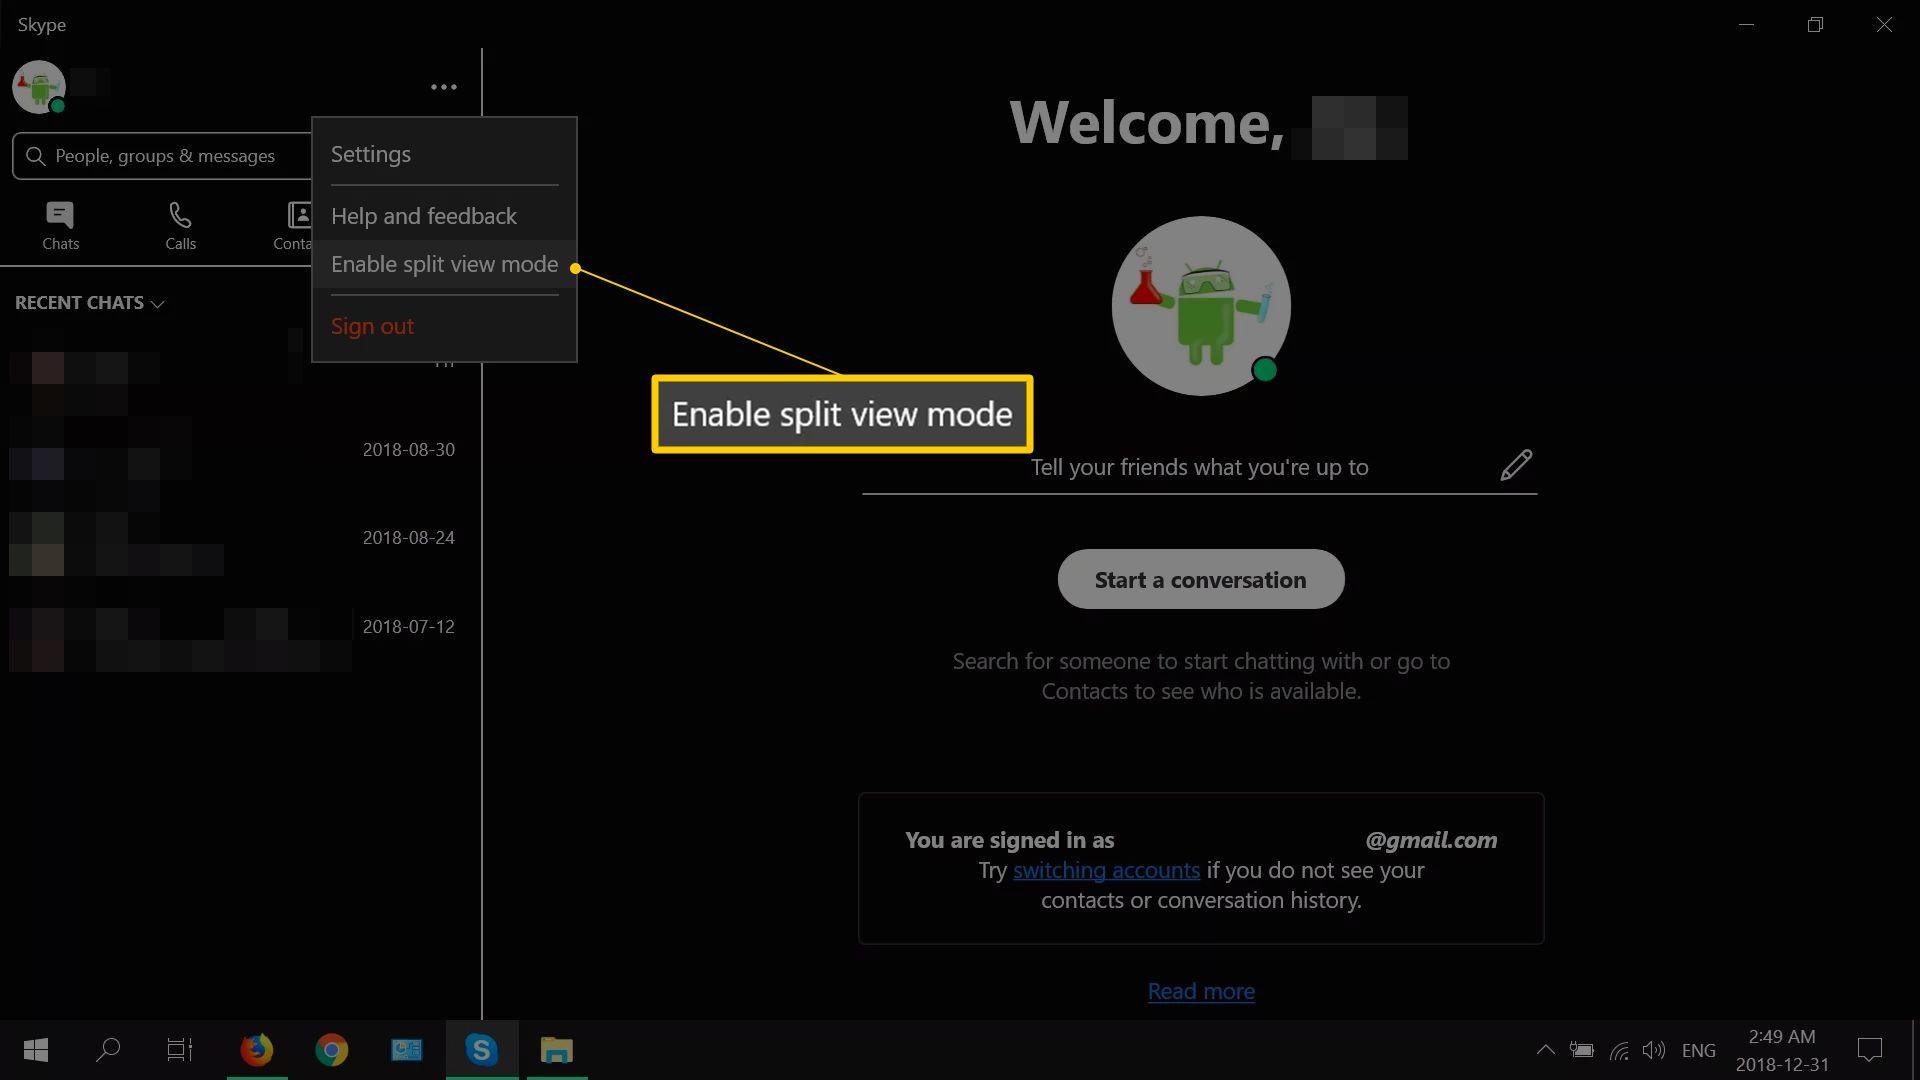 Enable split view mode in Skype's main menu